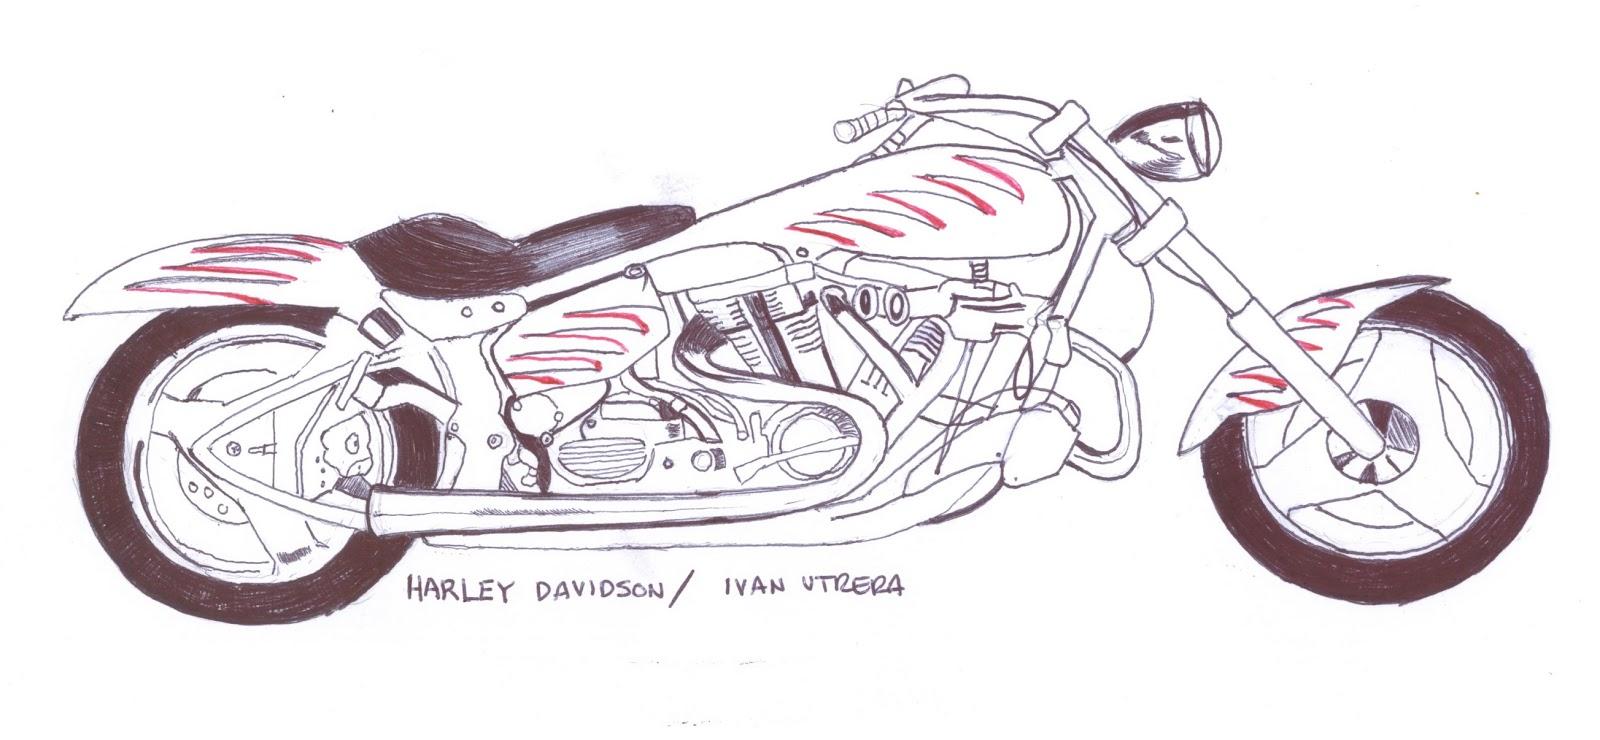 Harley Davidson a lapicero | Dibujo a lápiz, Reciclaje, Tallado en ...